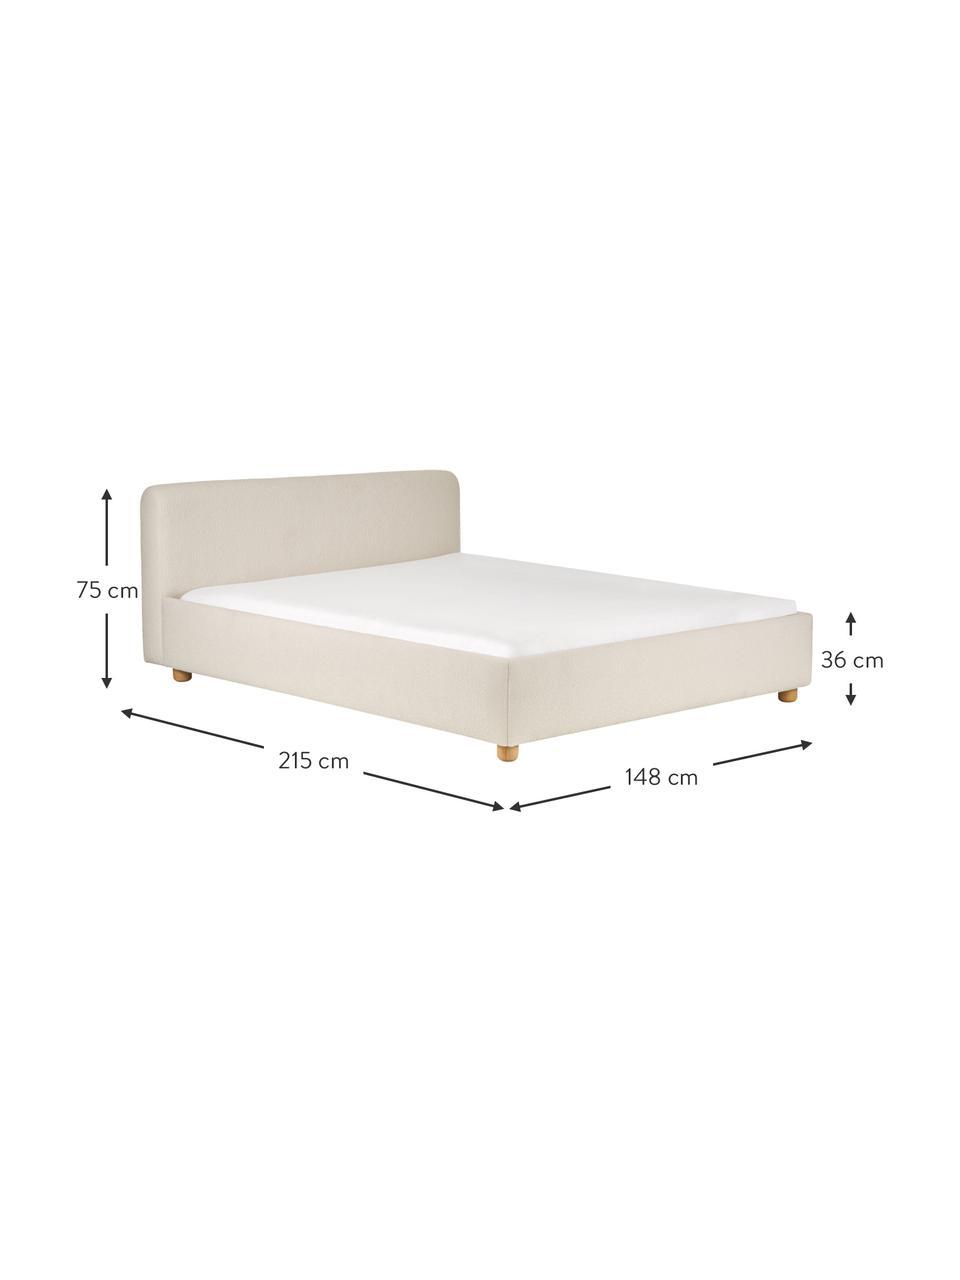 Bouclé  bed Serena in crèmewit, Frame: Massief berkenhout en pla, Bekleding: Bouclé-gestructureerd wee, Wit, 140 x 200 cm